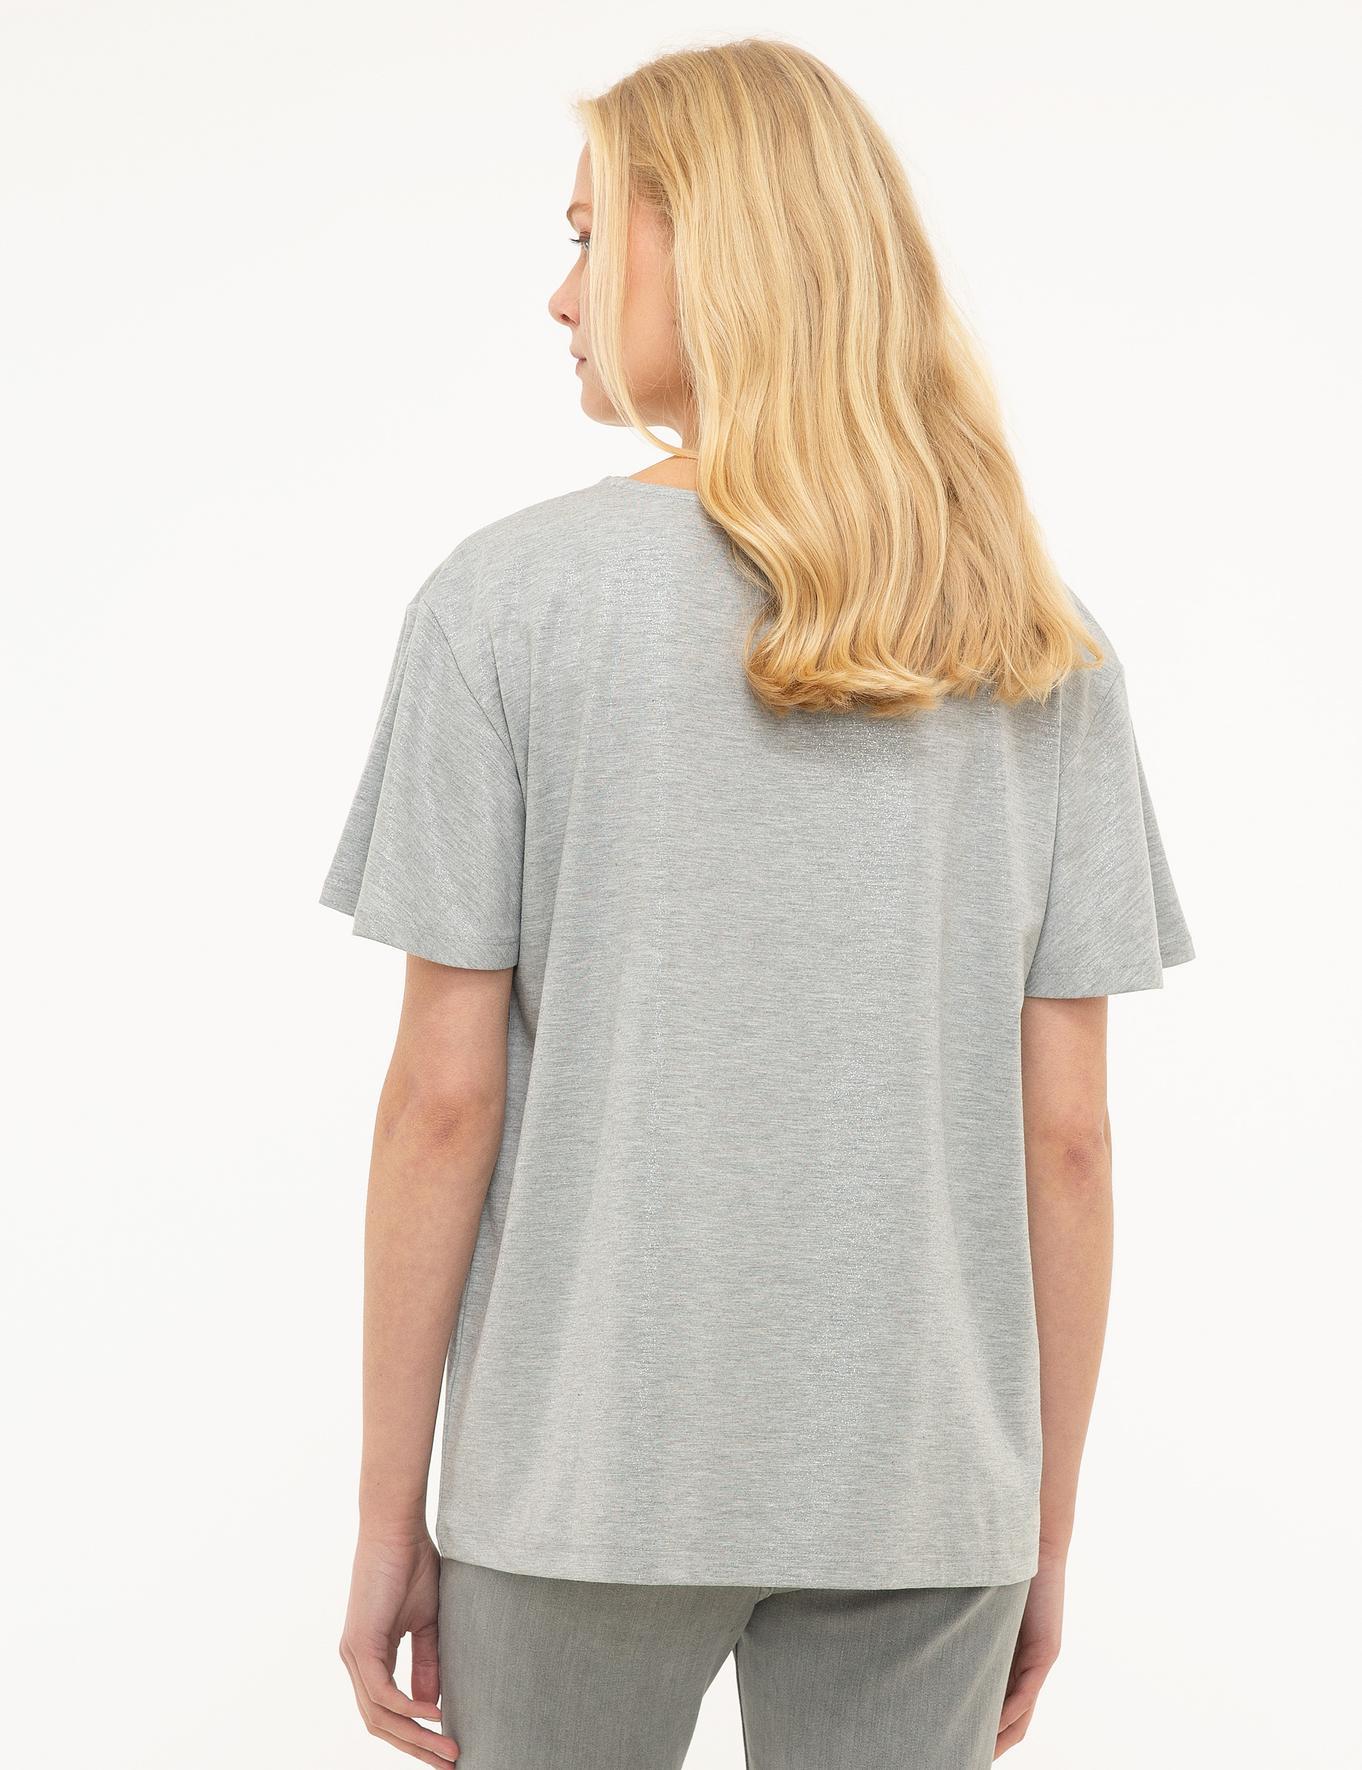 Açık Gri T-Shirt